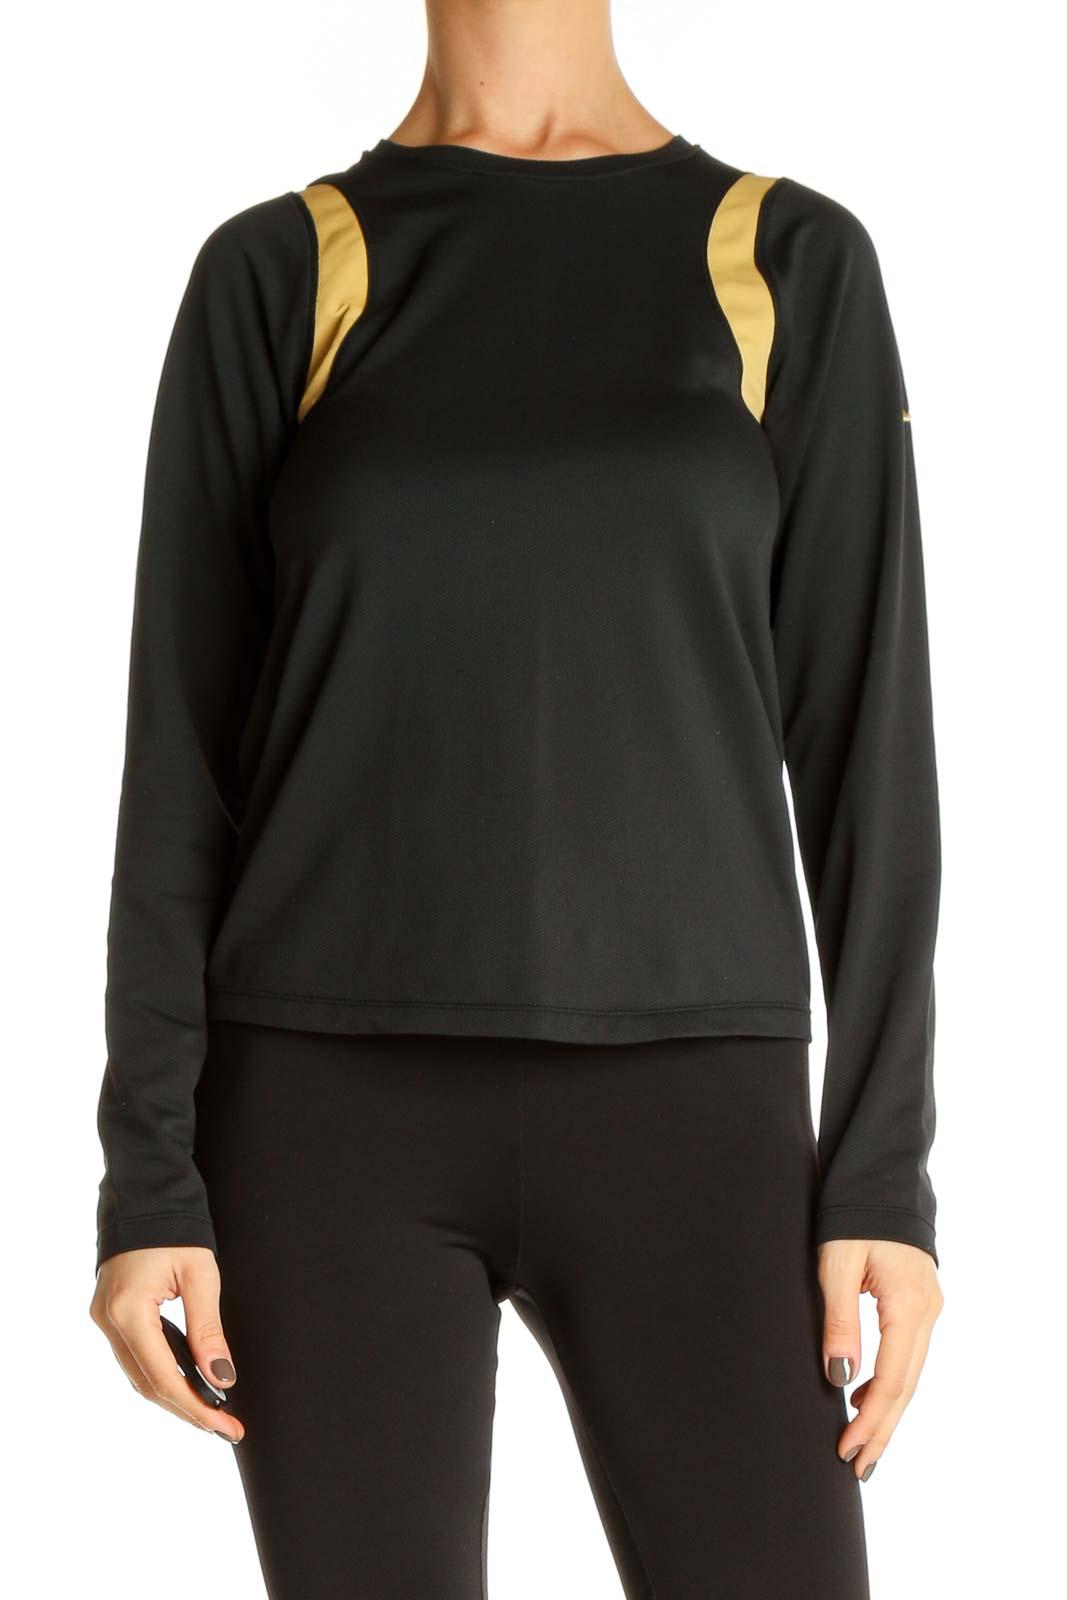 Black Colorblock Activewear Shirt Front